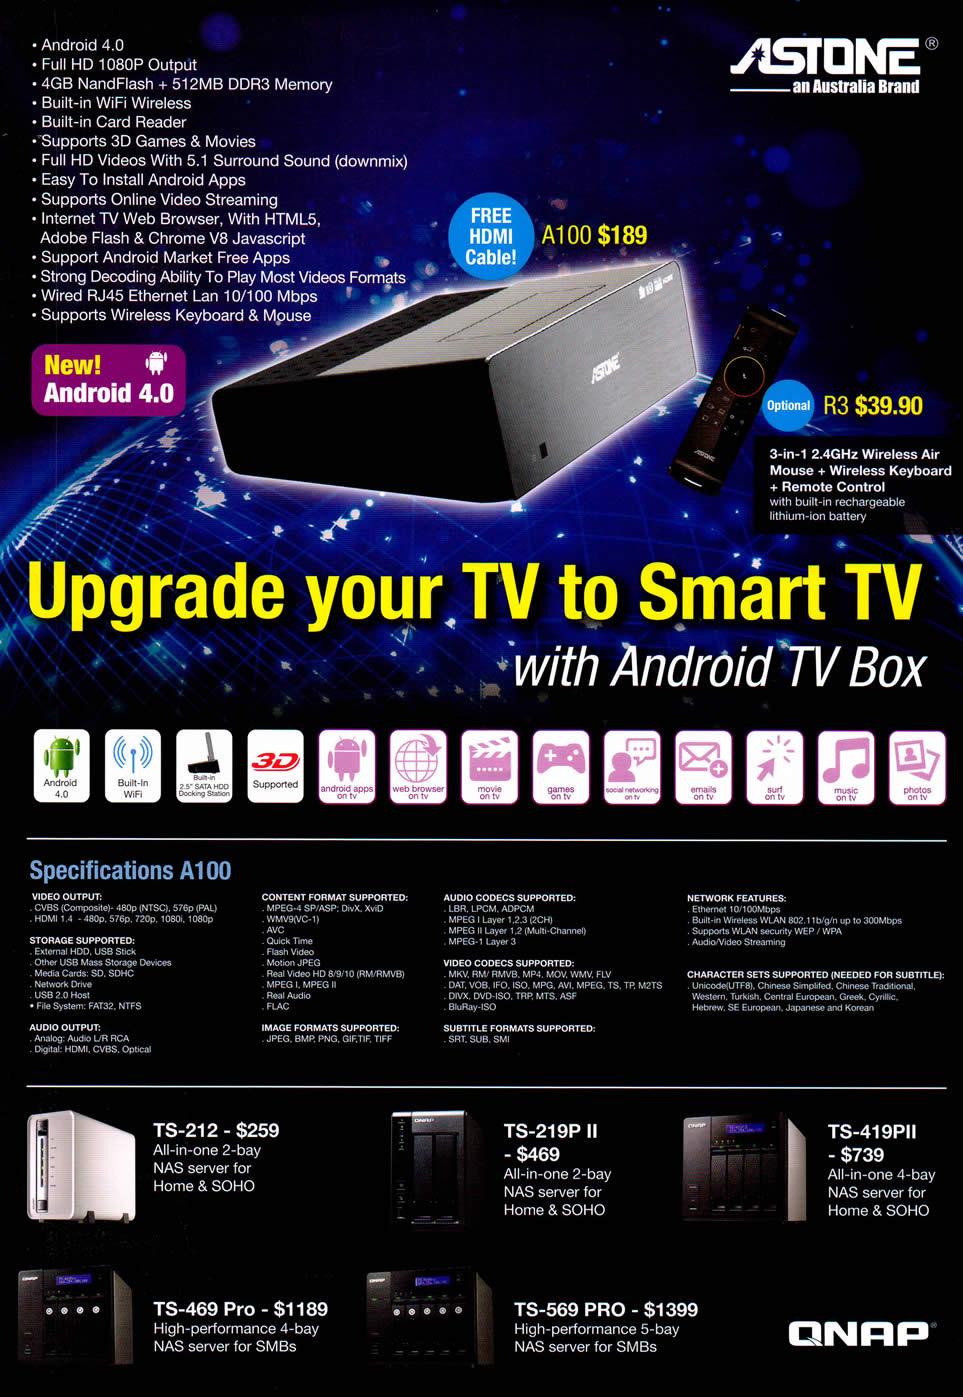 COMEX 2012 price list image brochure of Achieva Astone Media Player A100, R3 Android Qnap NAS TS-212, TS-219P, TS-419PII, TS-469 Pro, TS-569 Pro